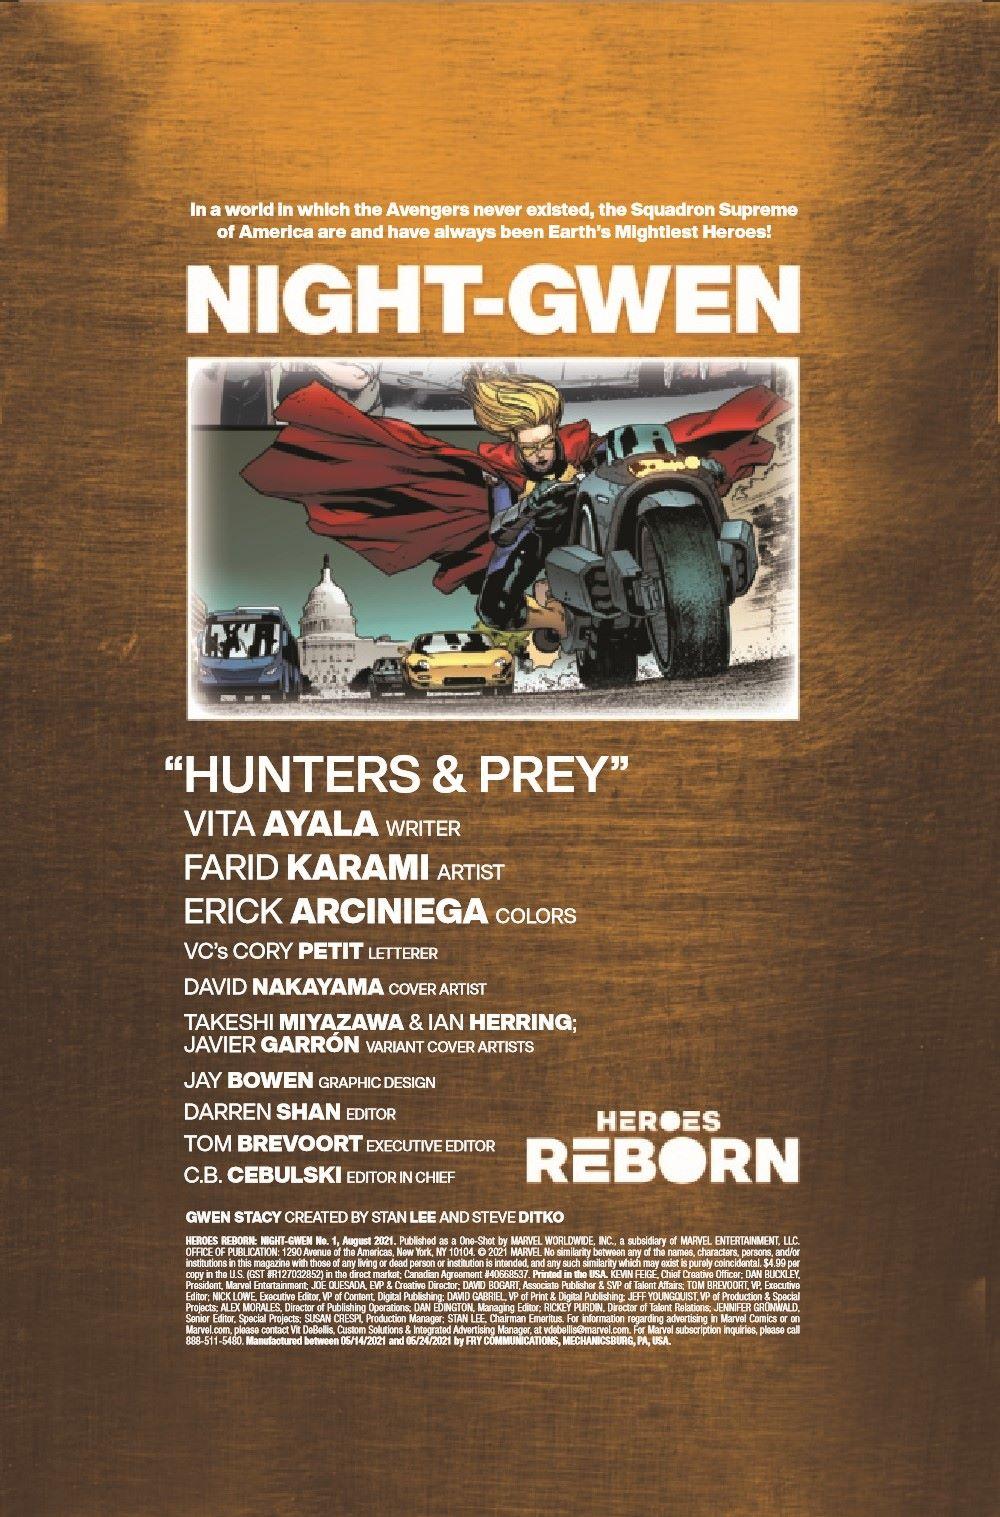 HRNIGHTGWEN2021001_Preview-2 ComicList Previews: HEROES REBORN NIGHT-GWEN #1